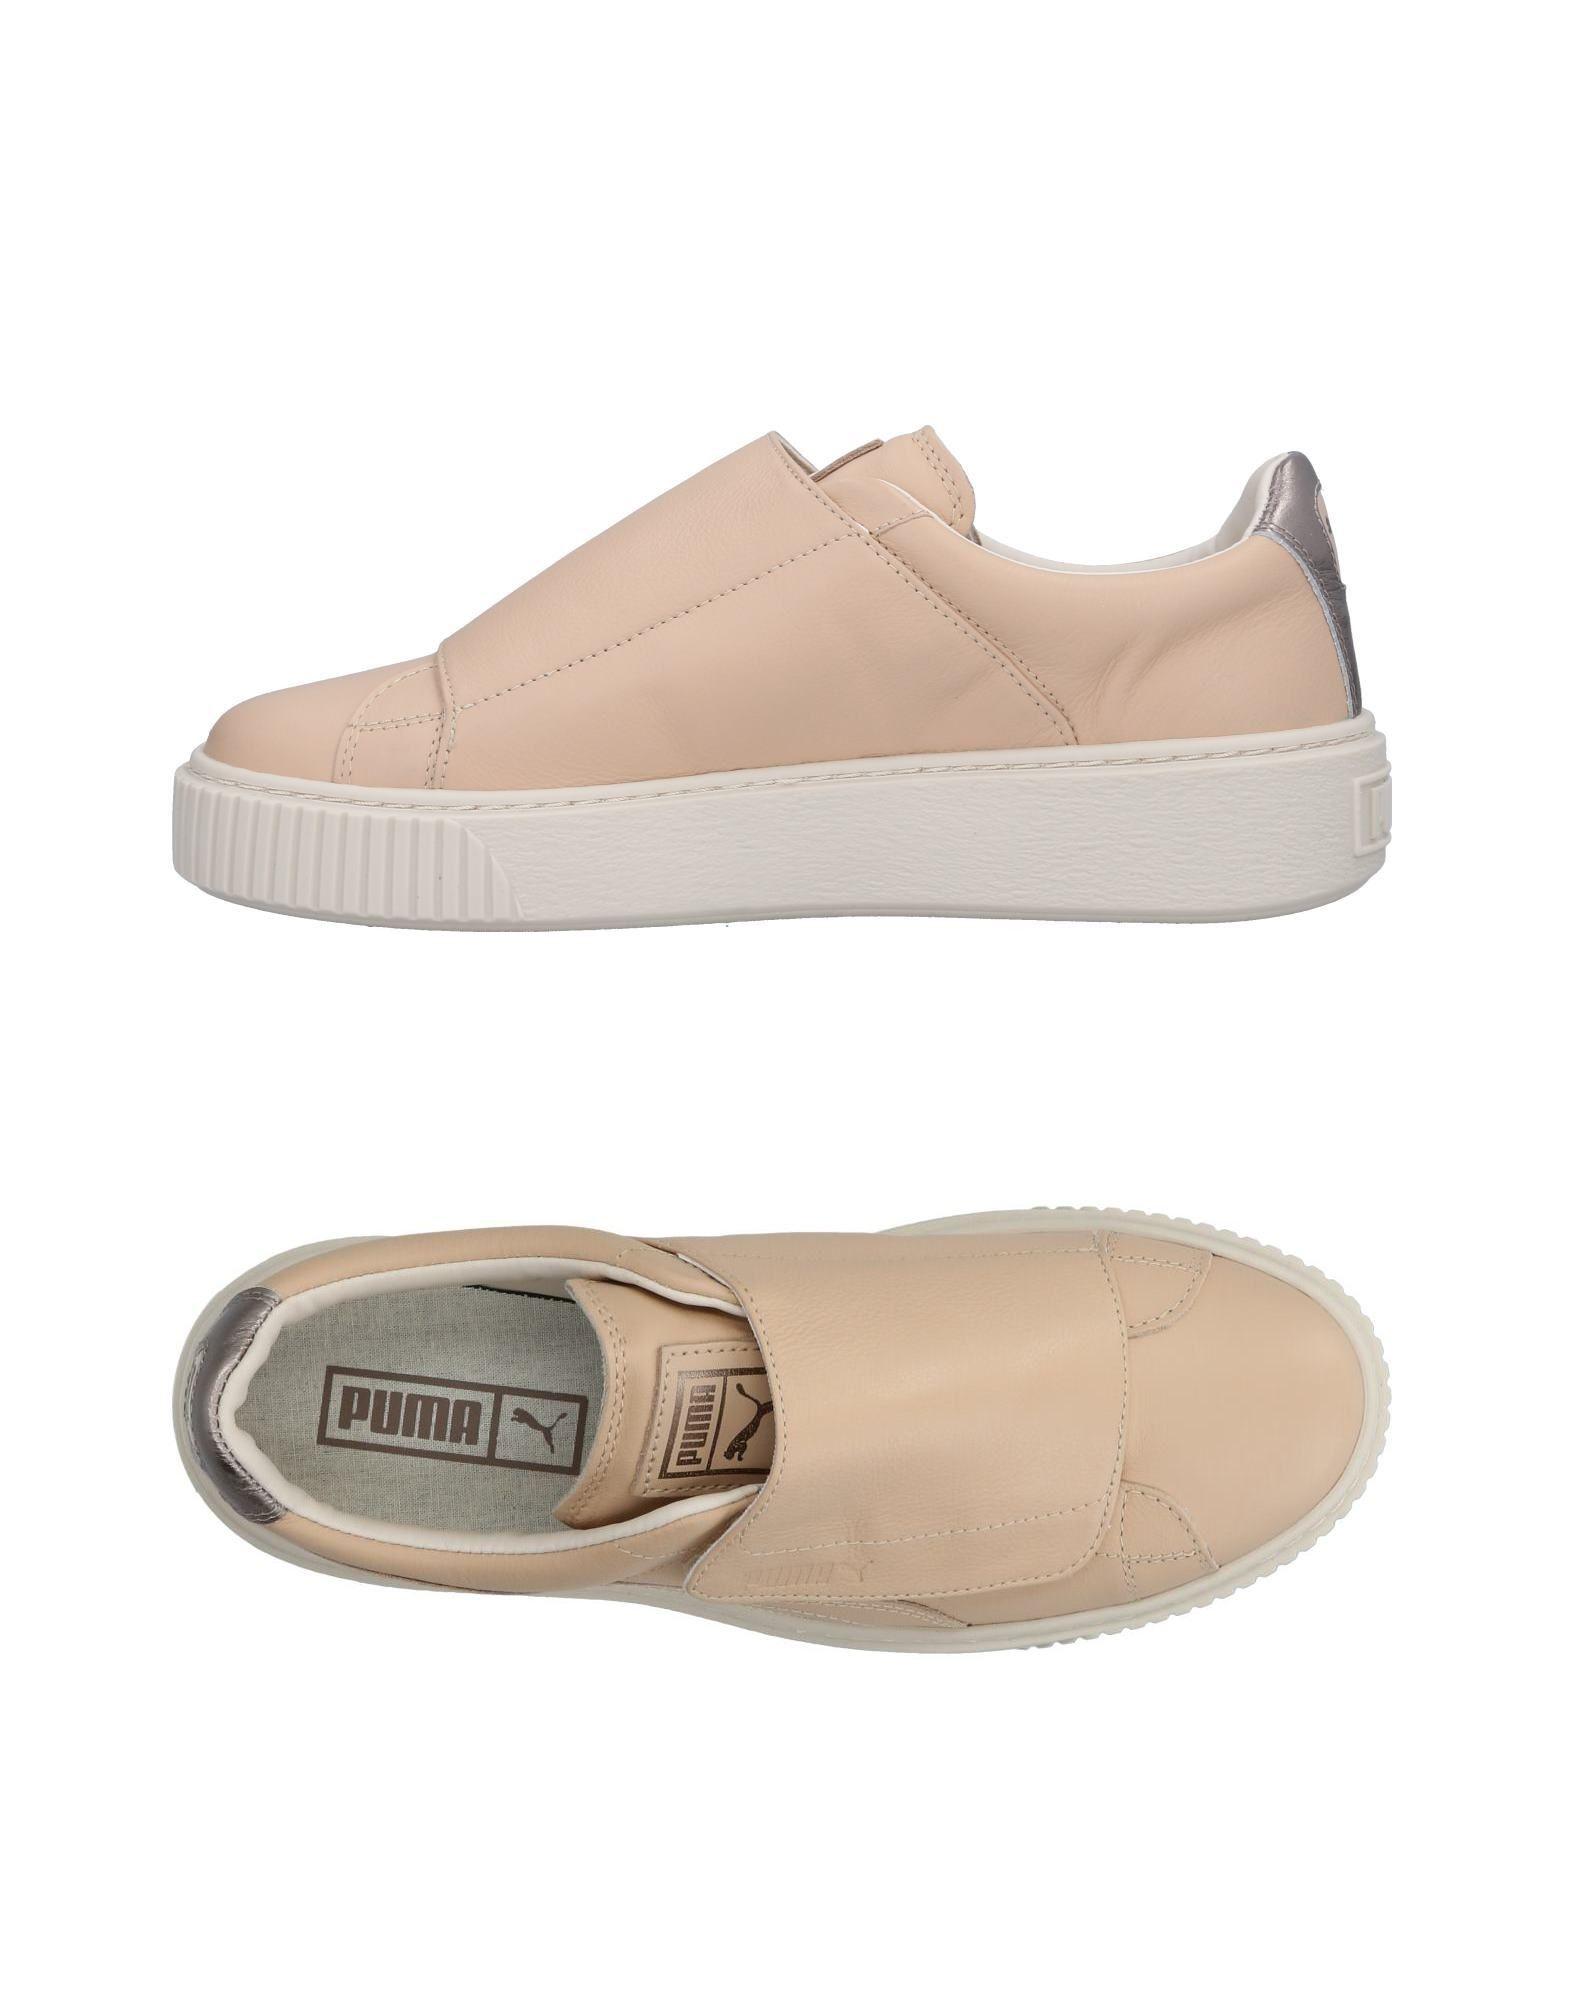 Puma Sneakers Damen  11495620FO Gute Qualität beliebte Schuhe